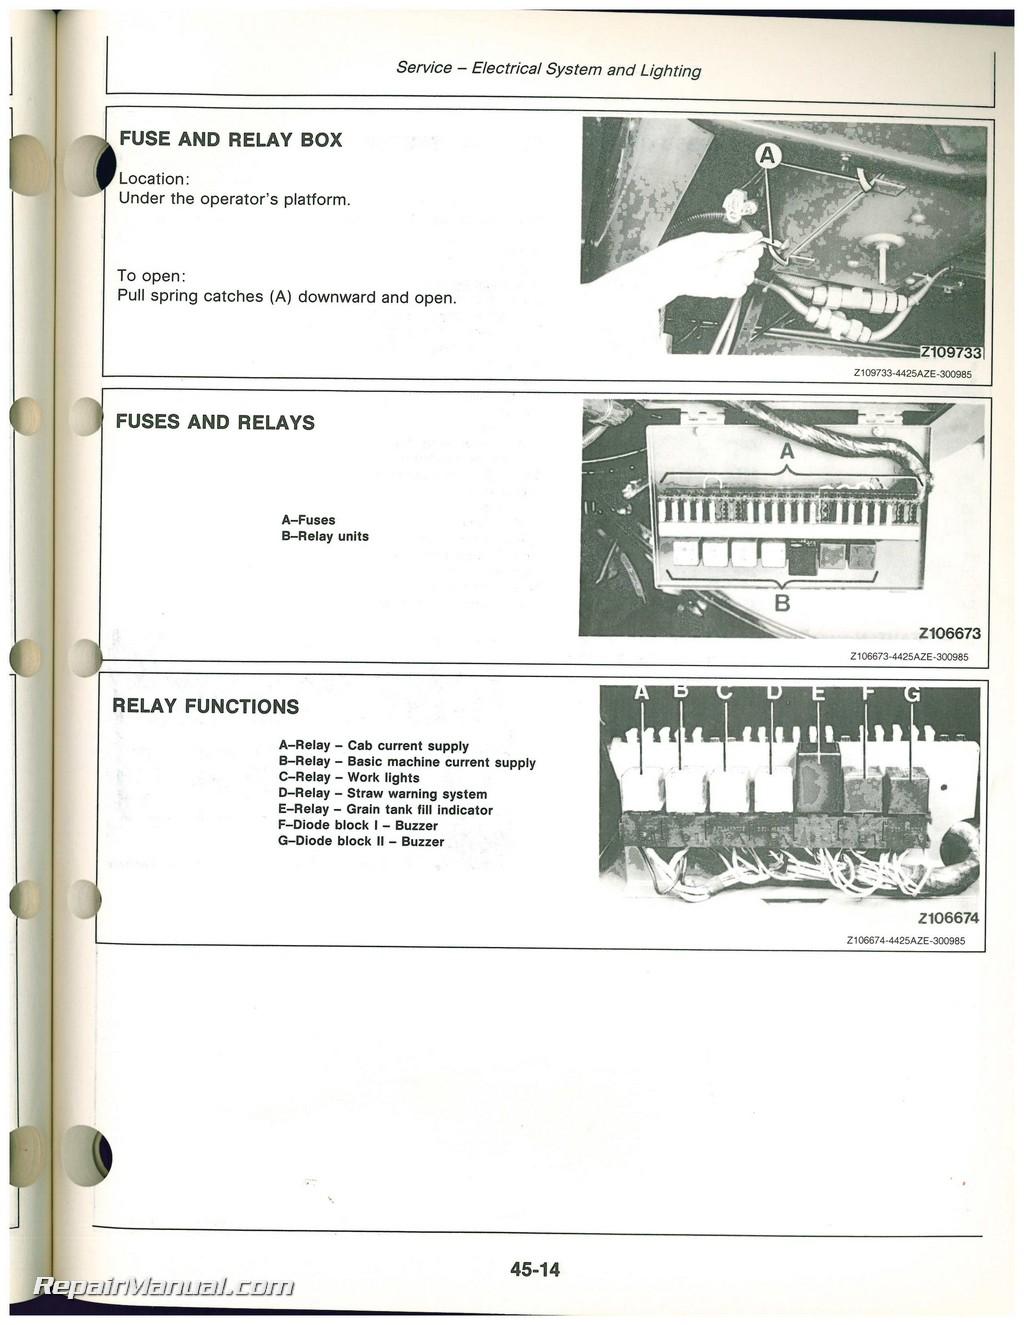 John Deere Combine Box Fuse Explained Wiring Diagrams John Deere 9500  Combine Craigslist John Deere 9500 Combine Fuse Box